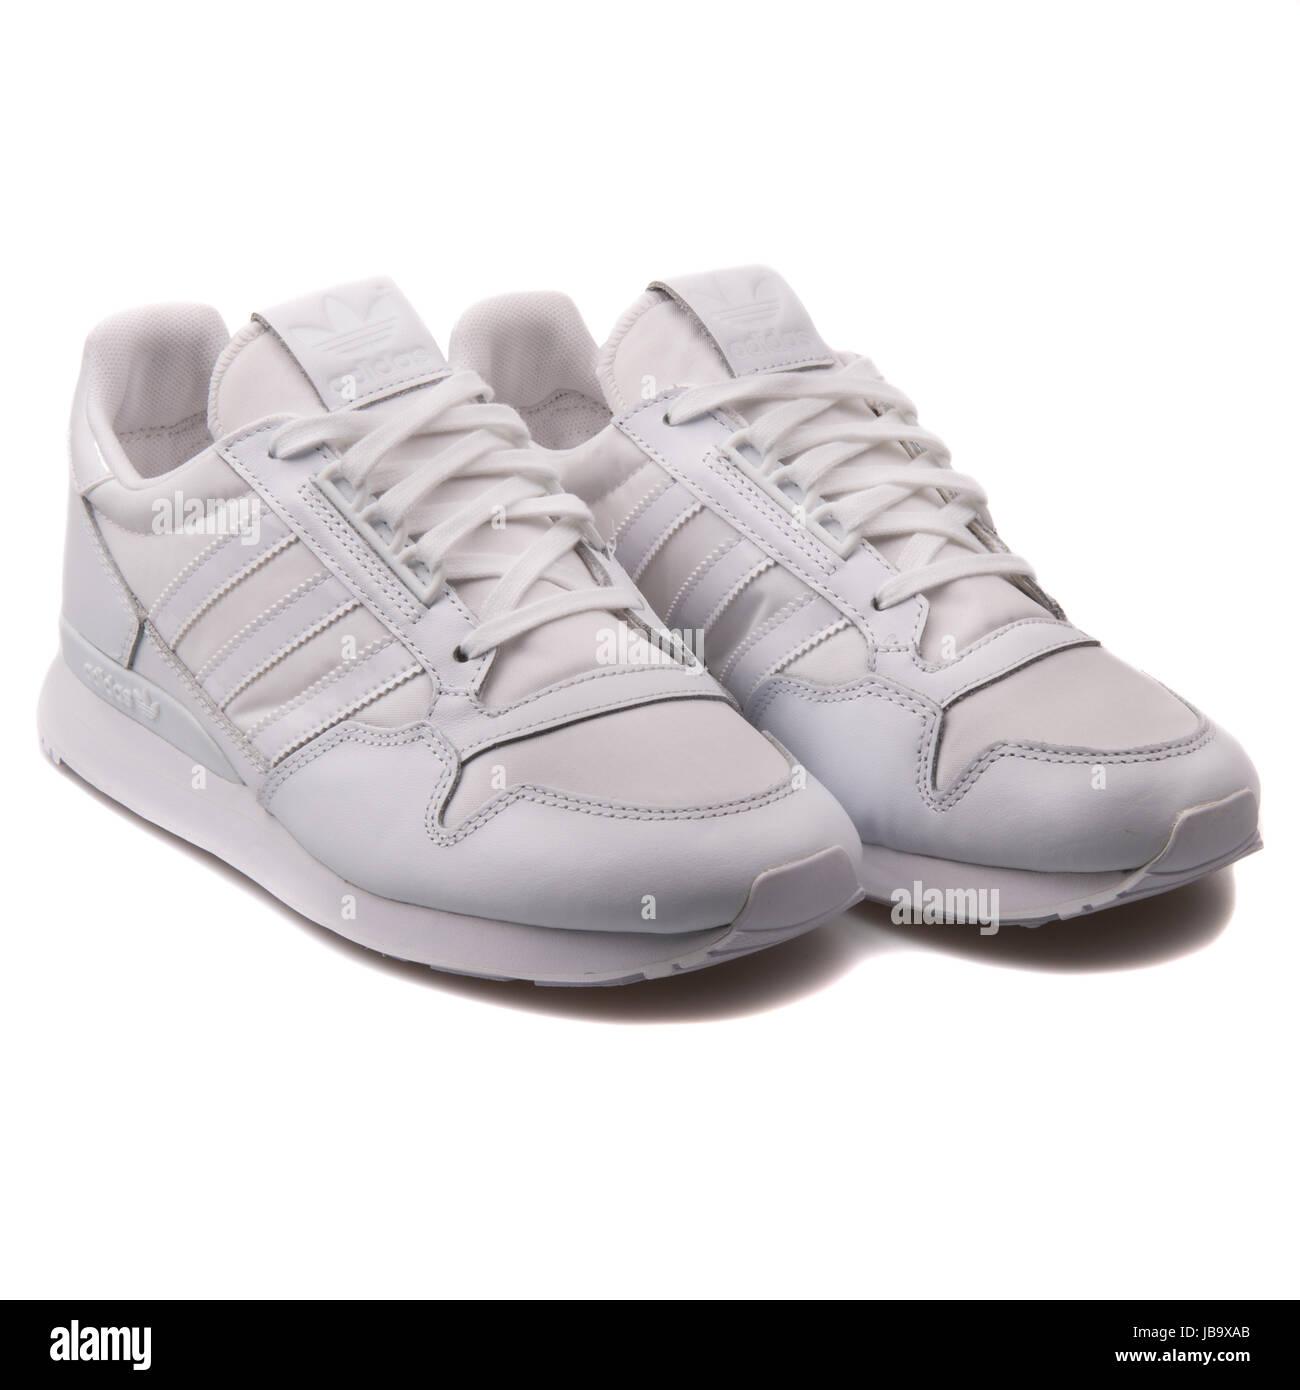 on sale cc65e f0bd2 adidas zx 500 rm donna nero